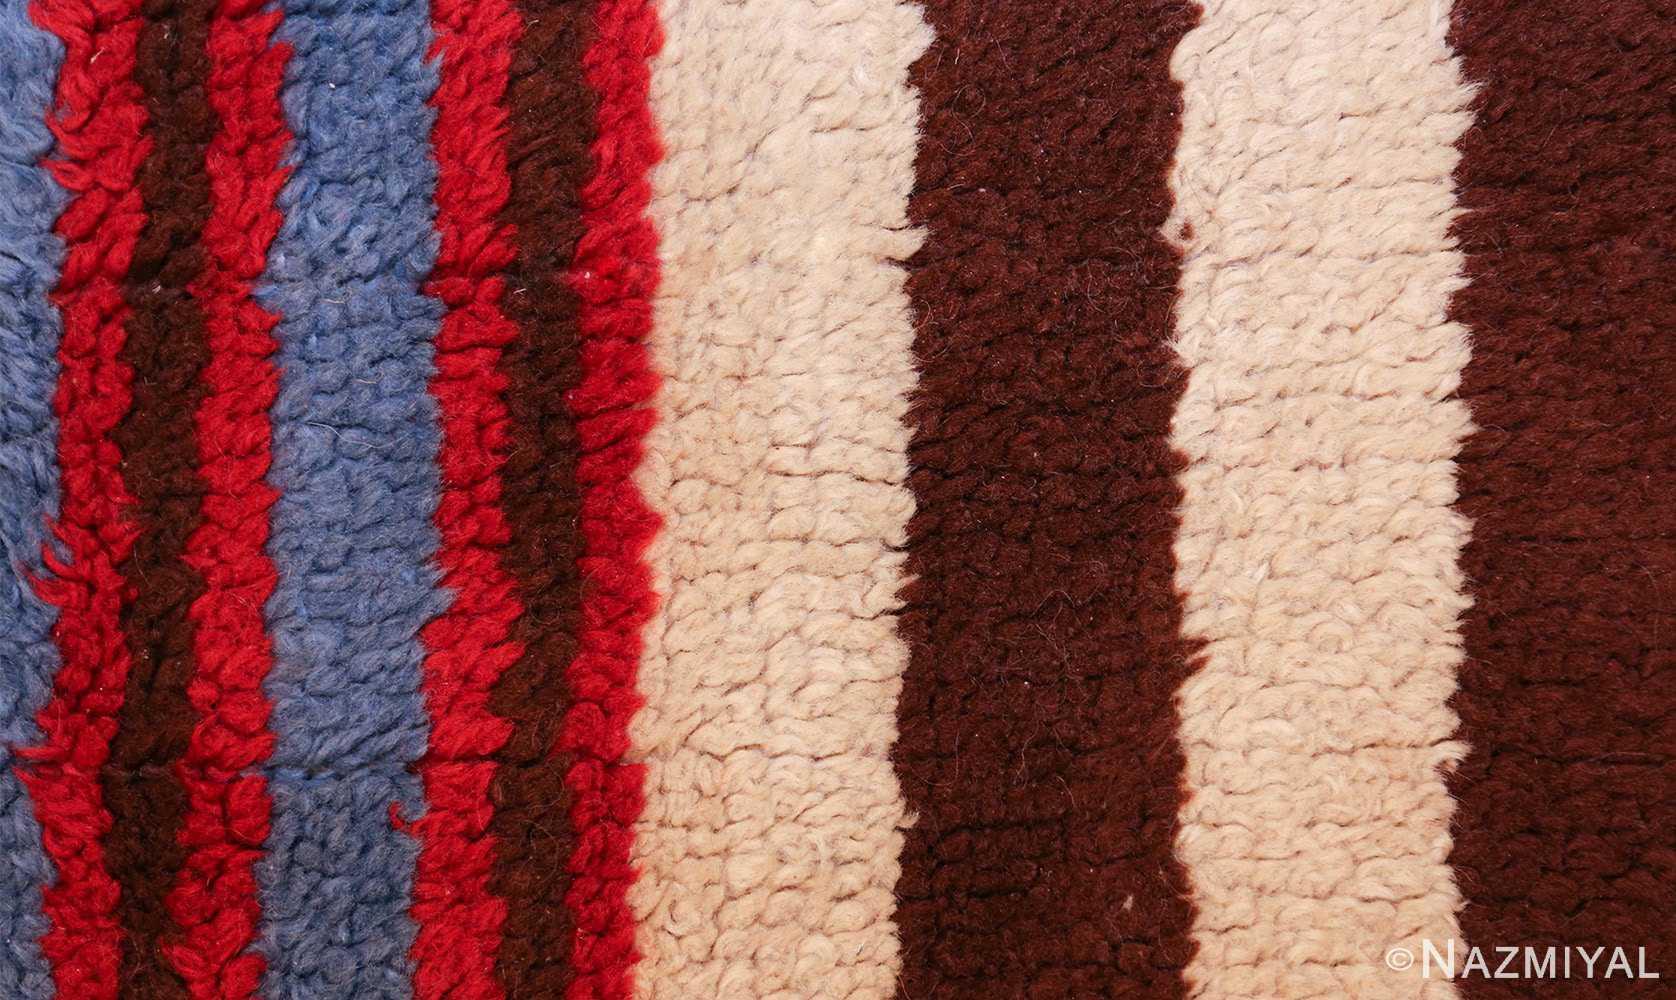 colorful geometric navajo design american rug 49523 colors Nazmiyal